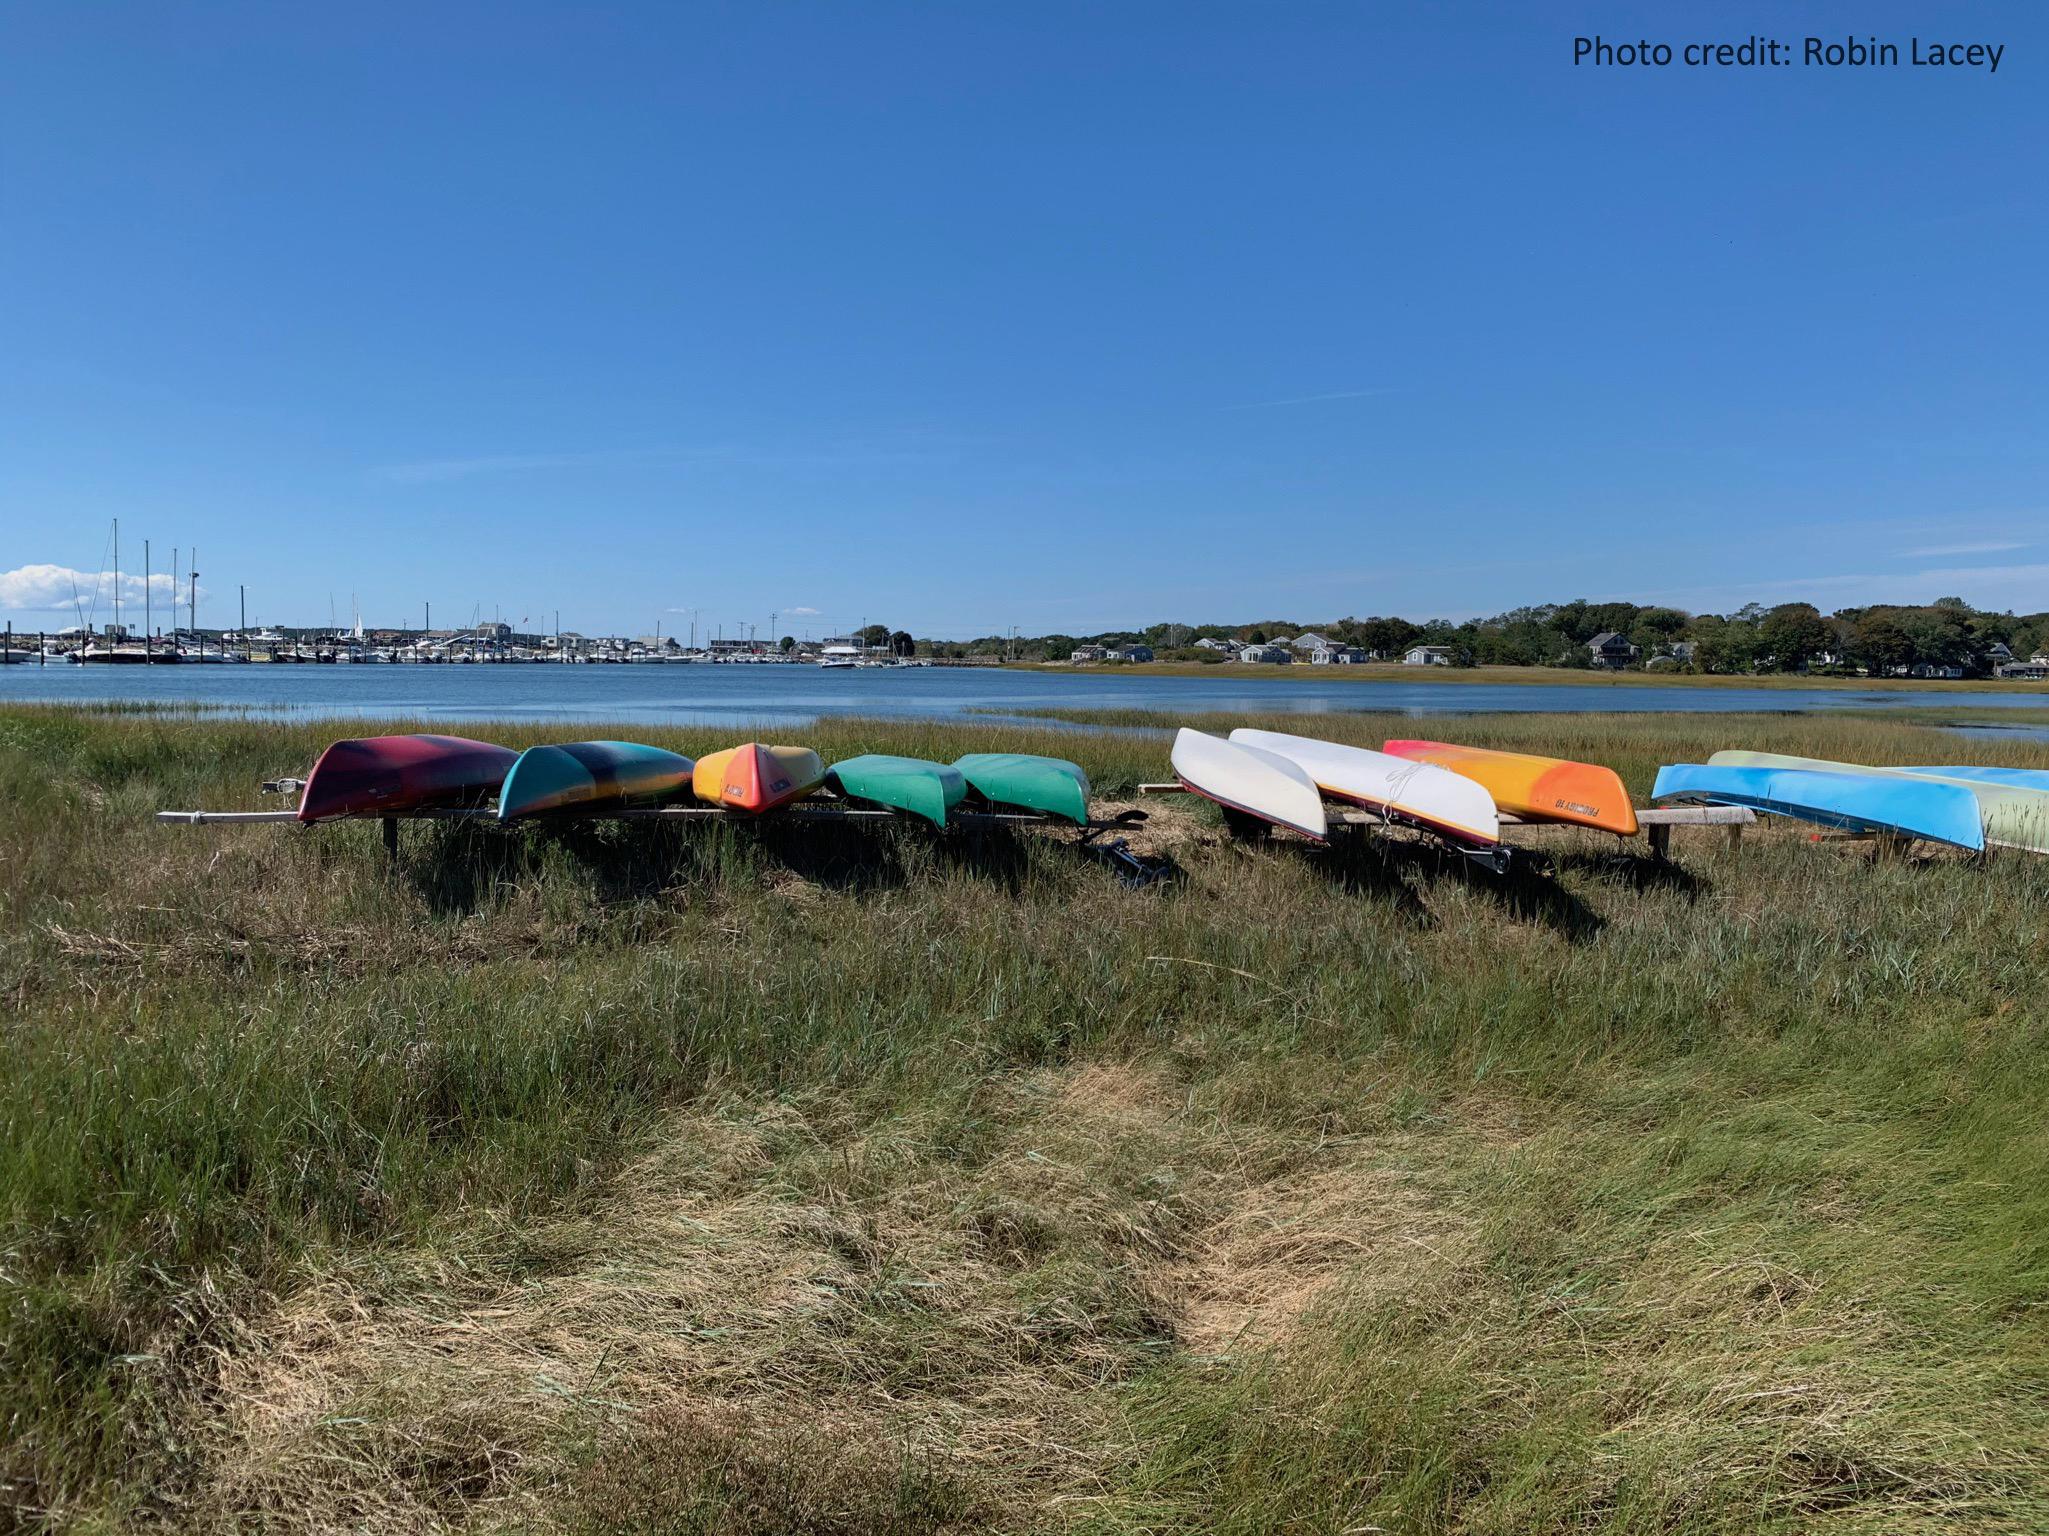 Kayaks and canoes at Wellfleet Harbor, Massachusetts